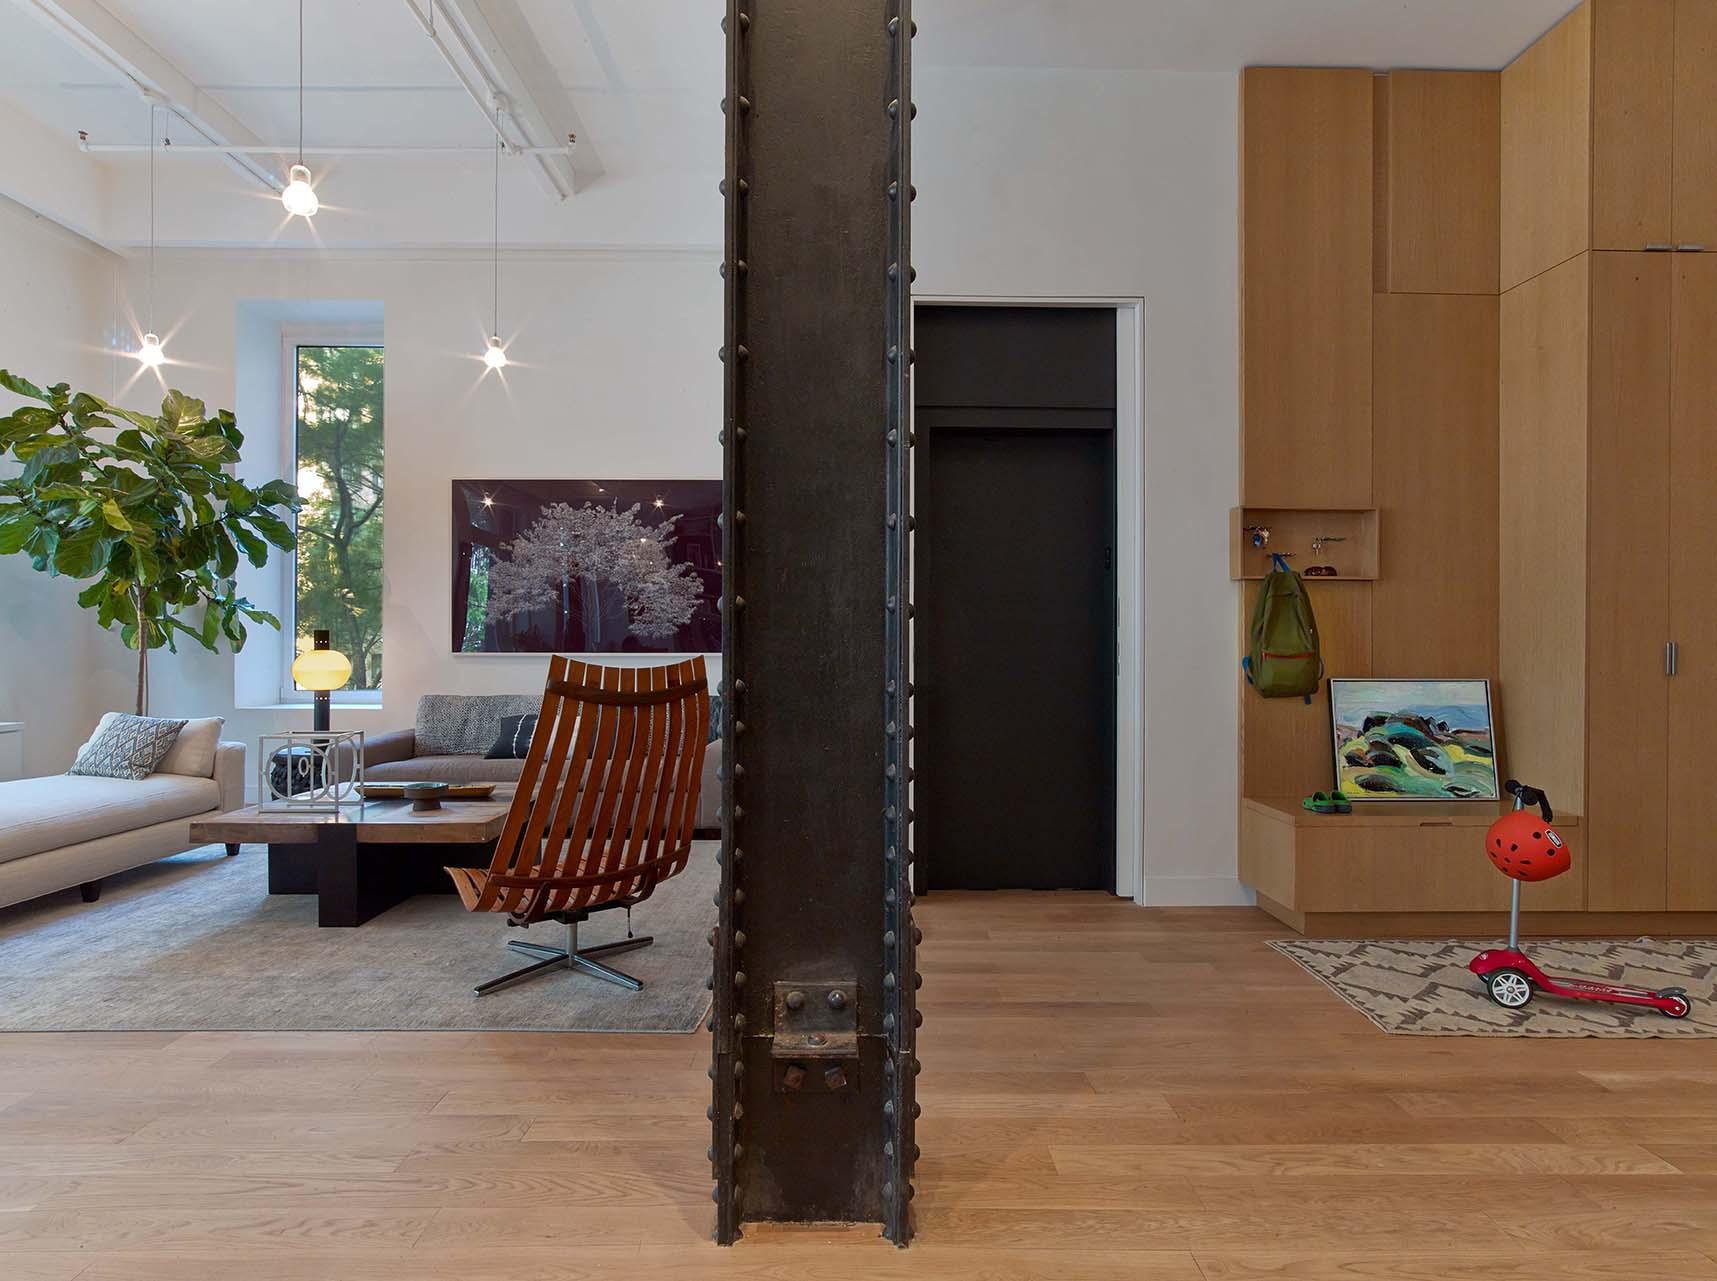 Flat Iron Loft Living Space Shot 4